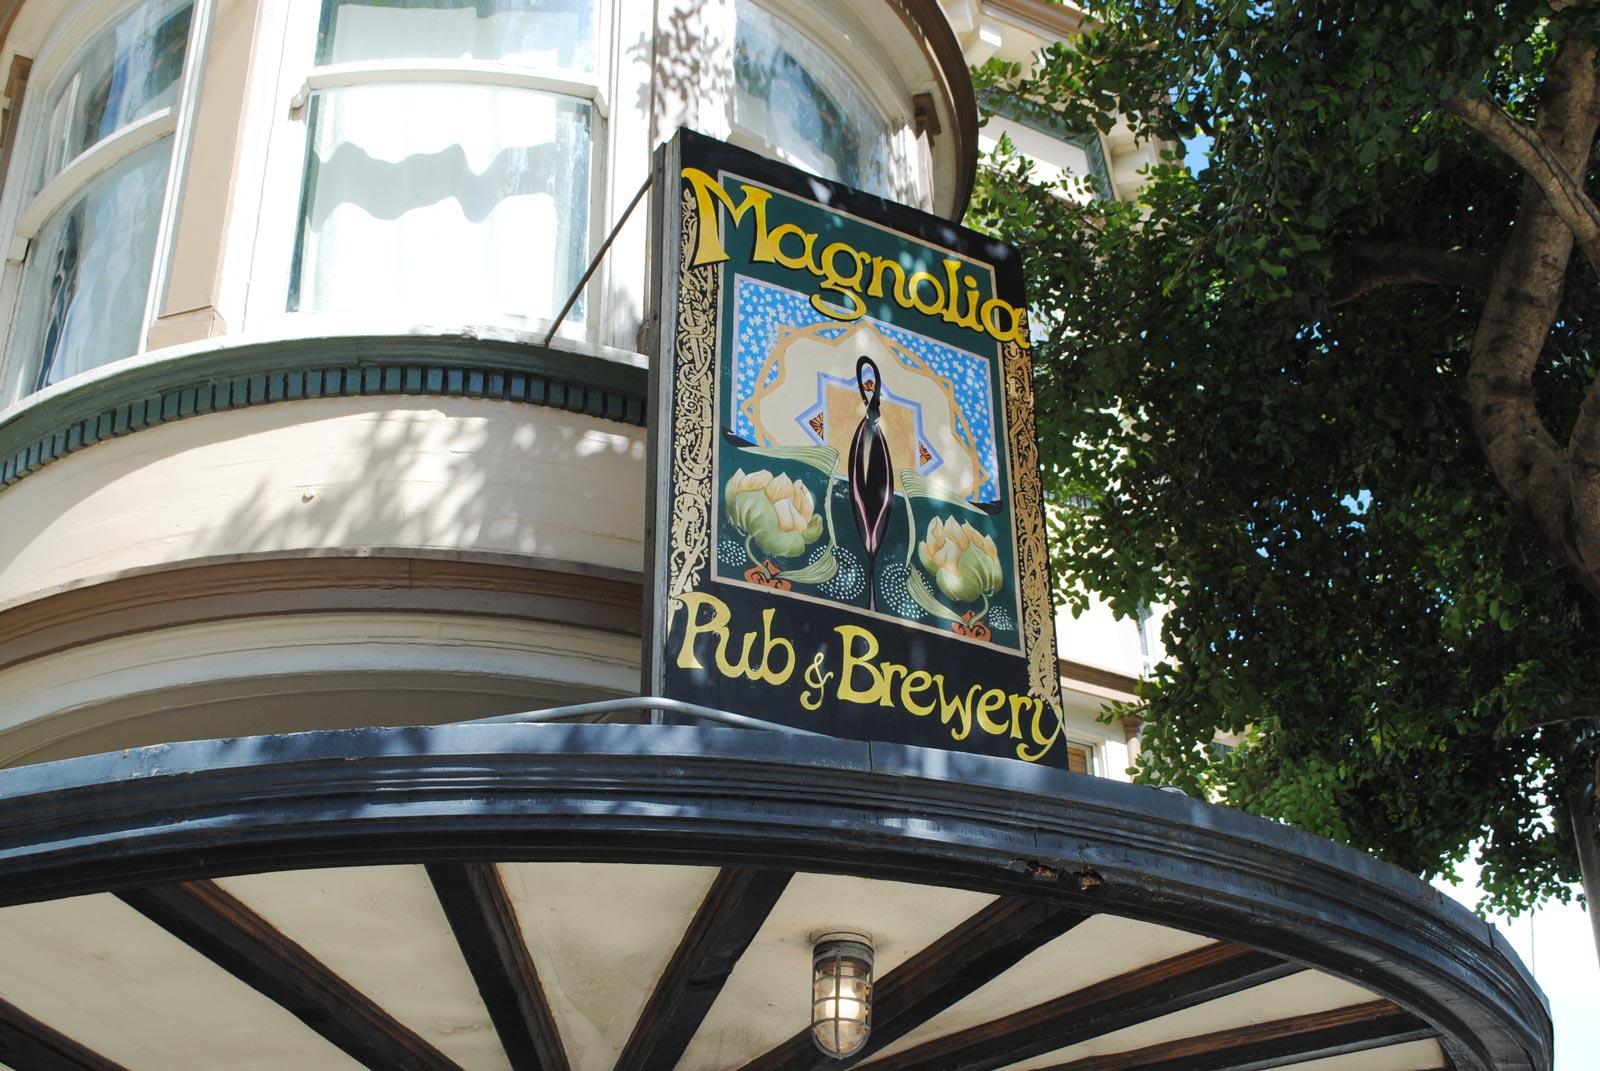 DETOUR: San, Francisco, CA – Magnolia Brewery